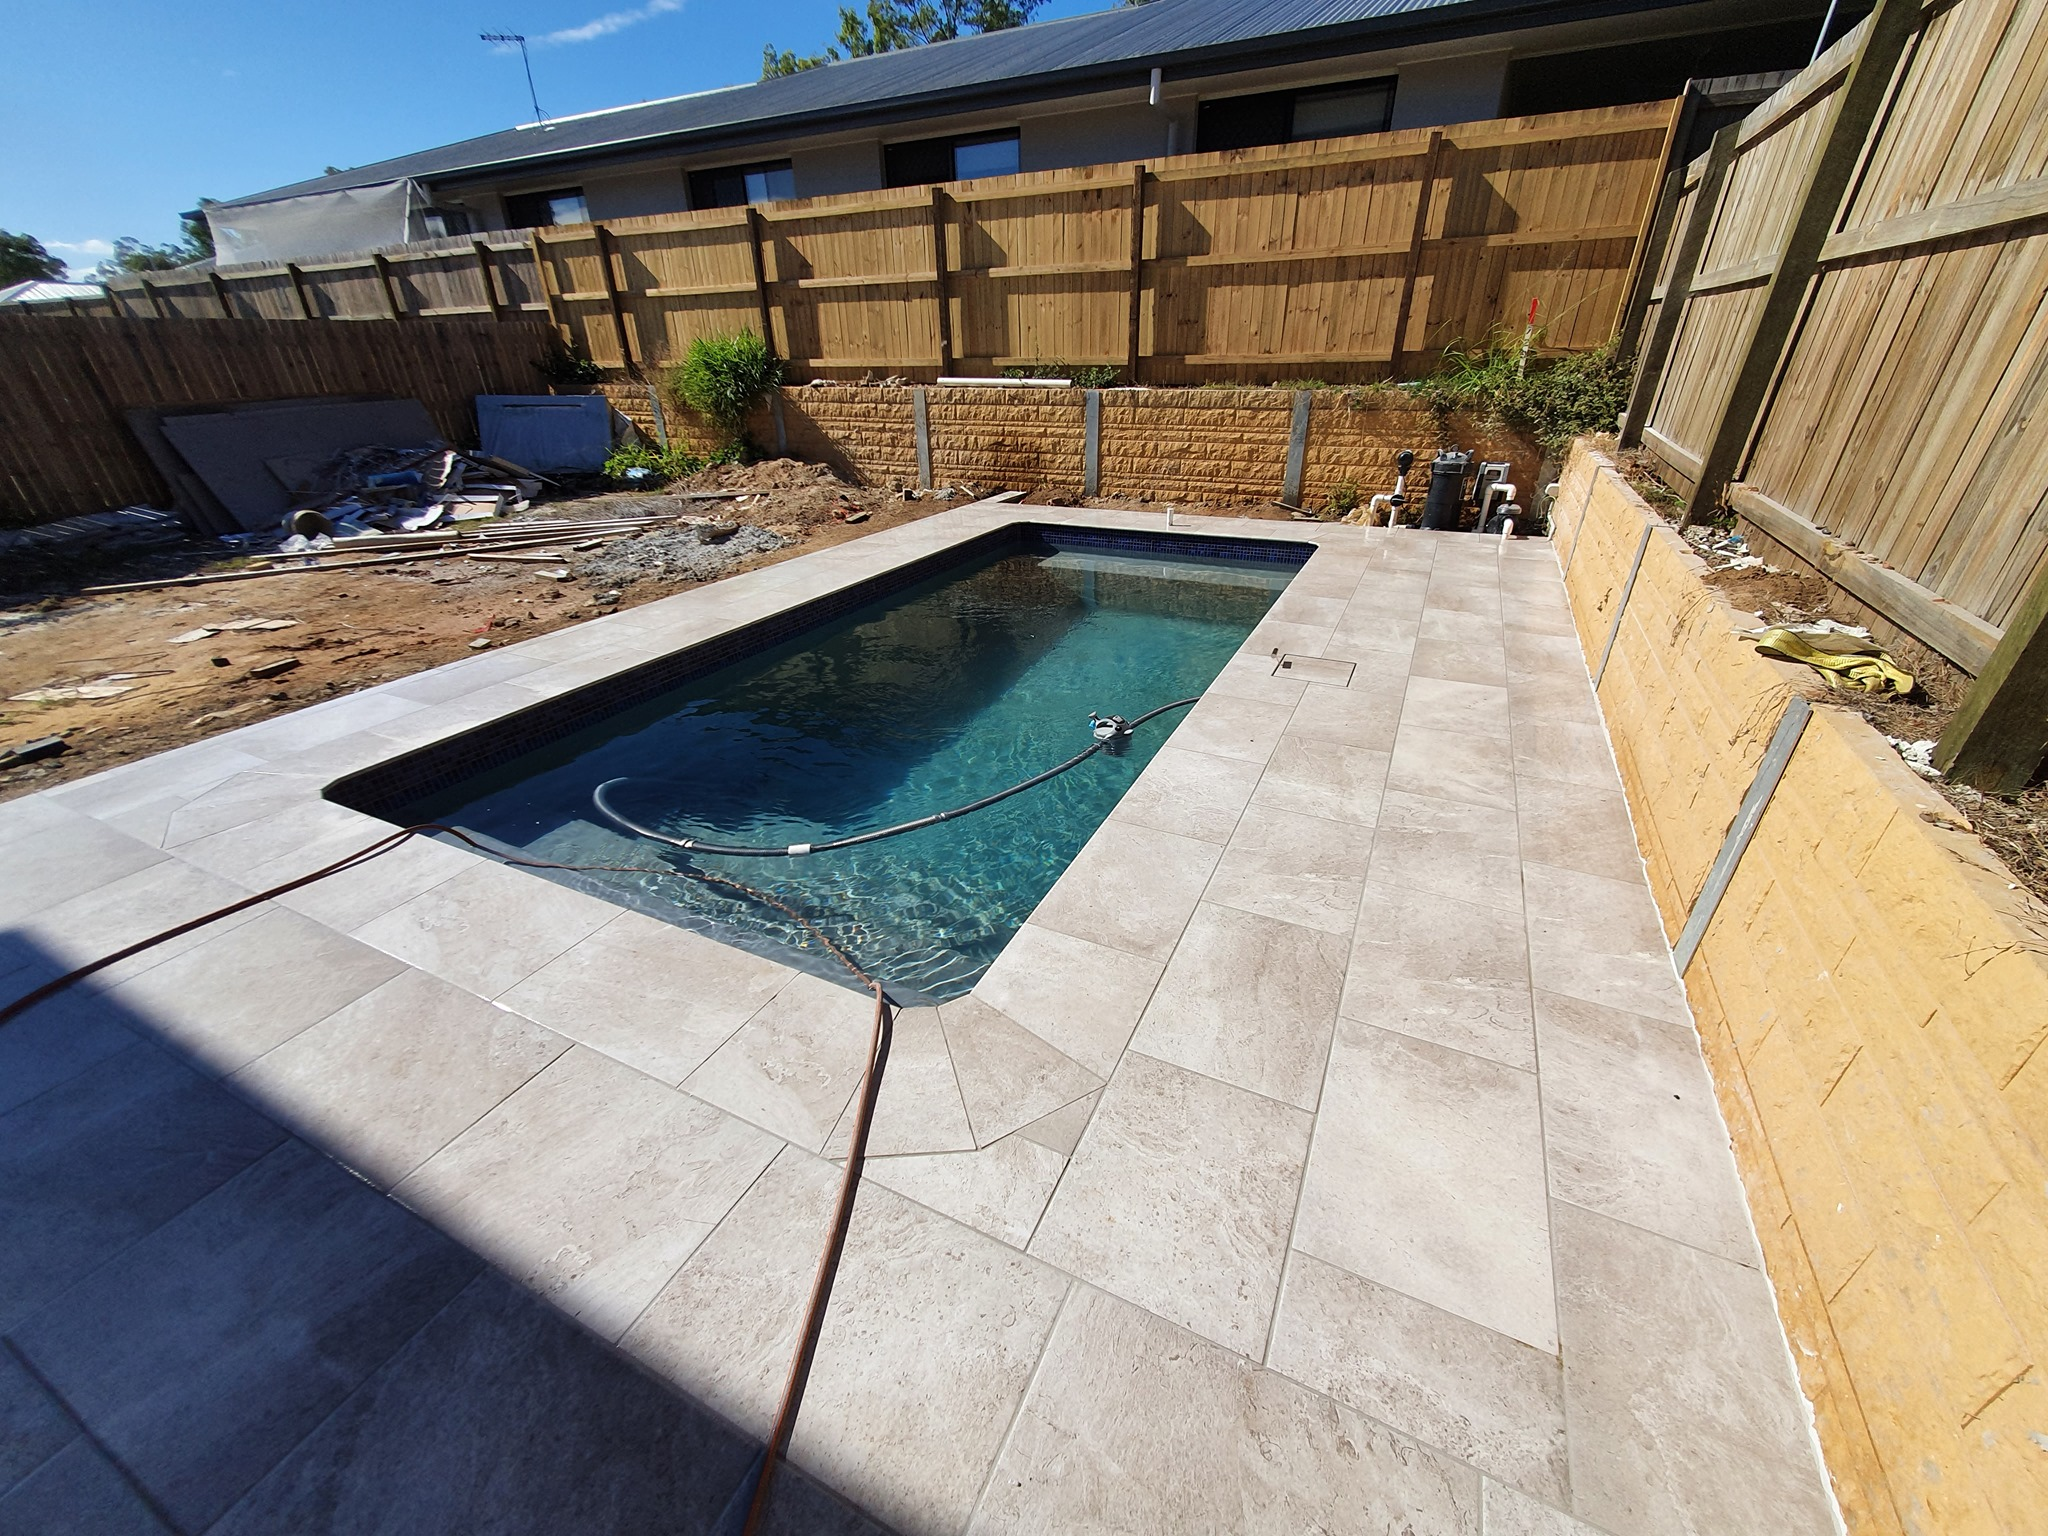 Poolscapes - hardscapes and landscaping Brisbane